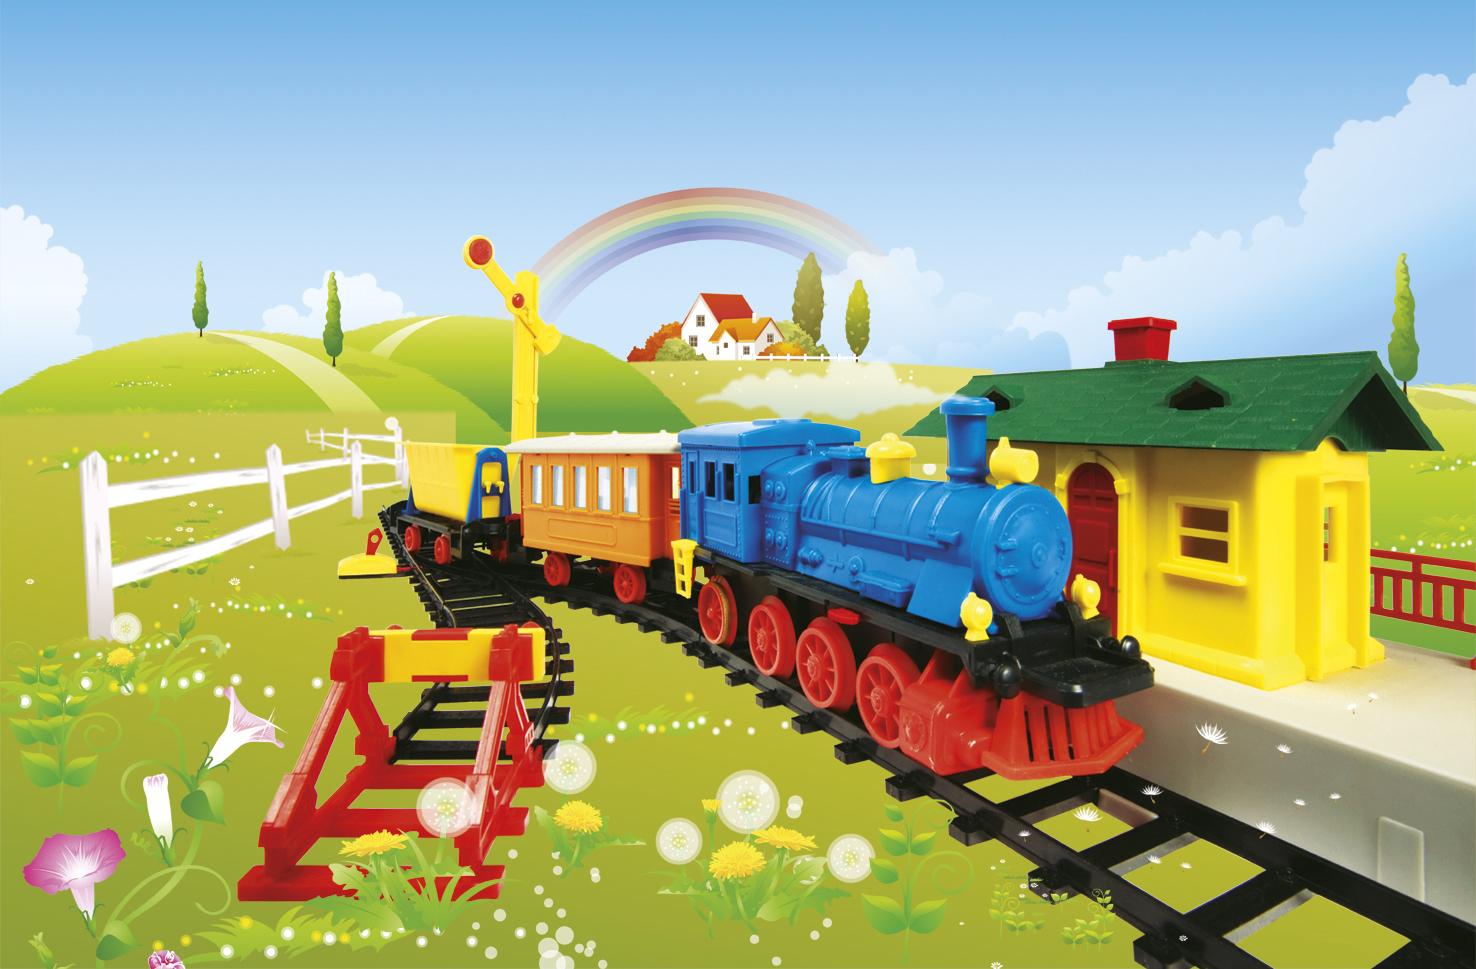 Картинка дети и железная дорога